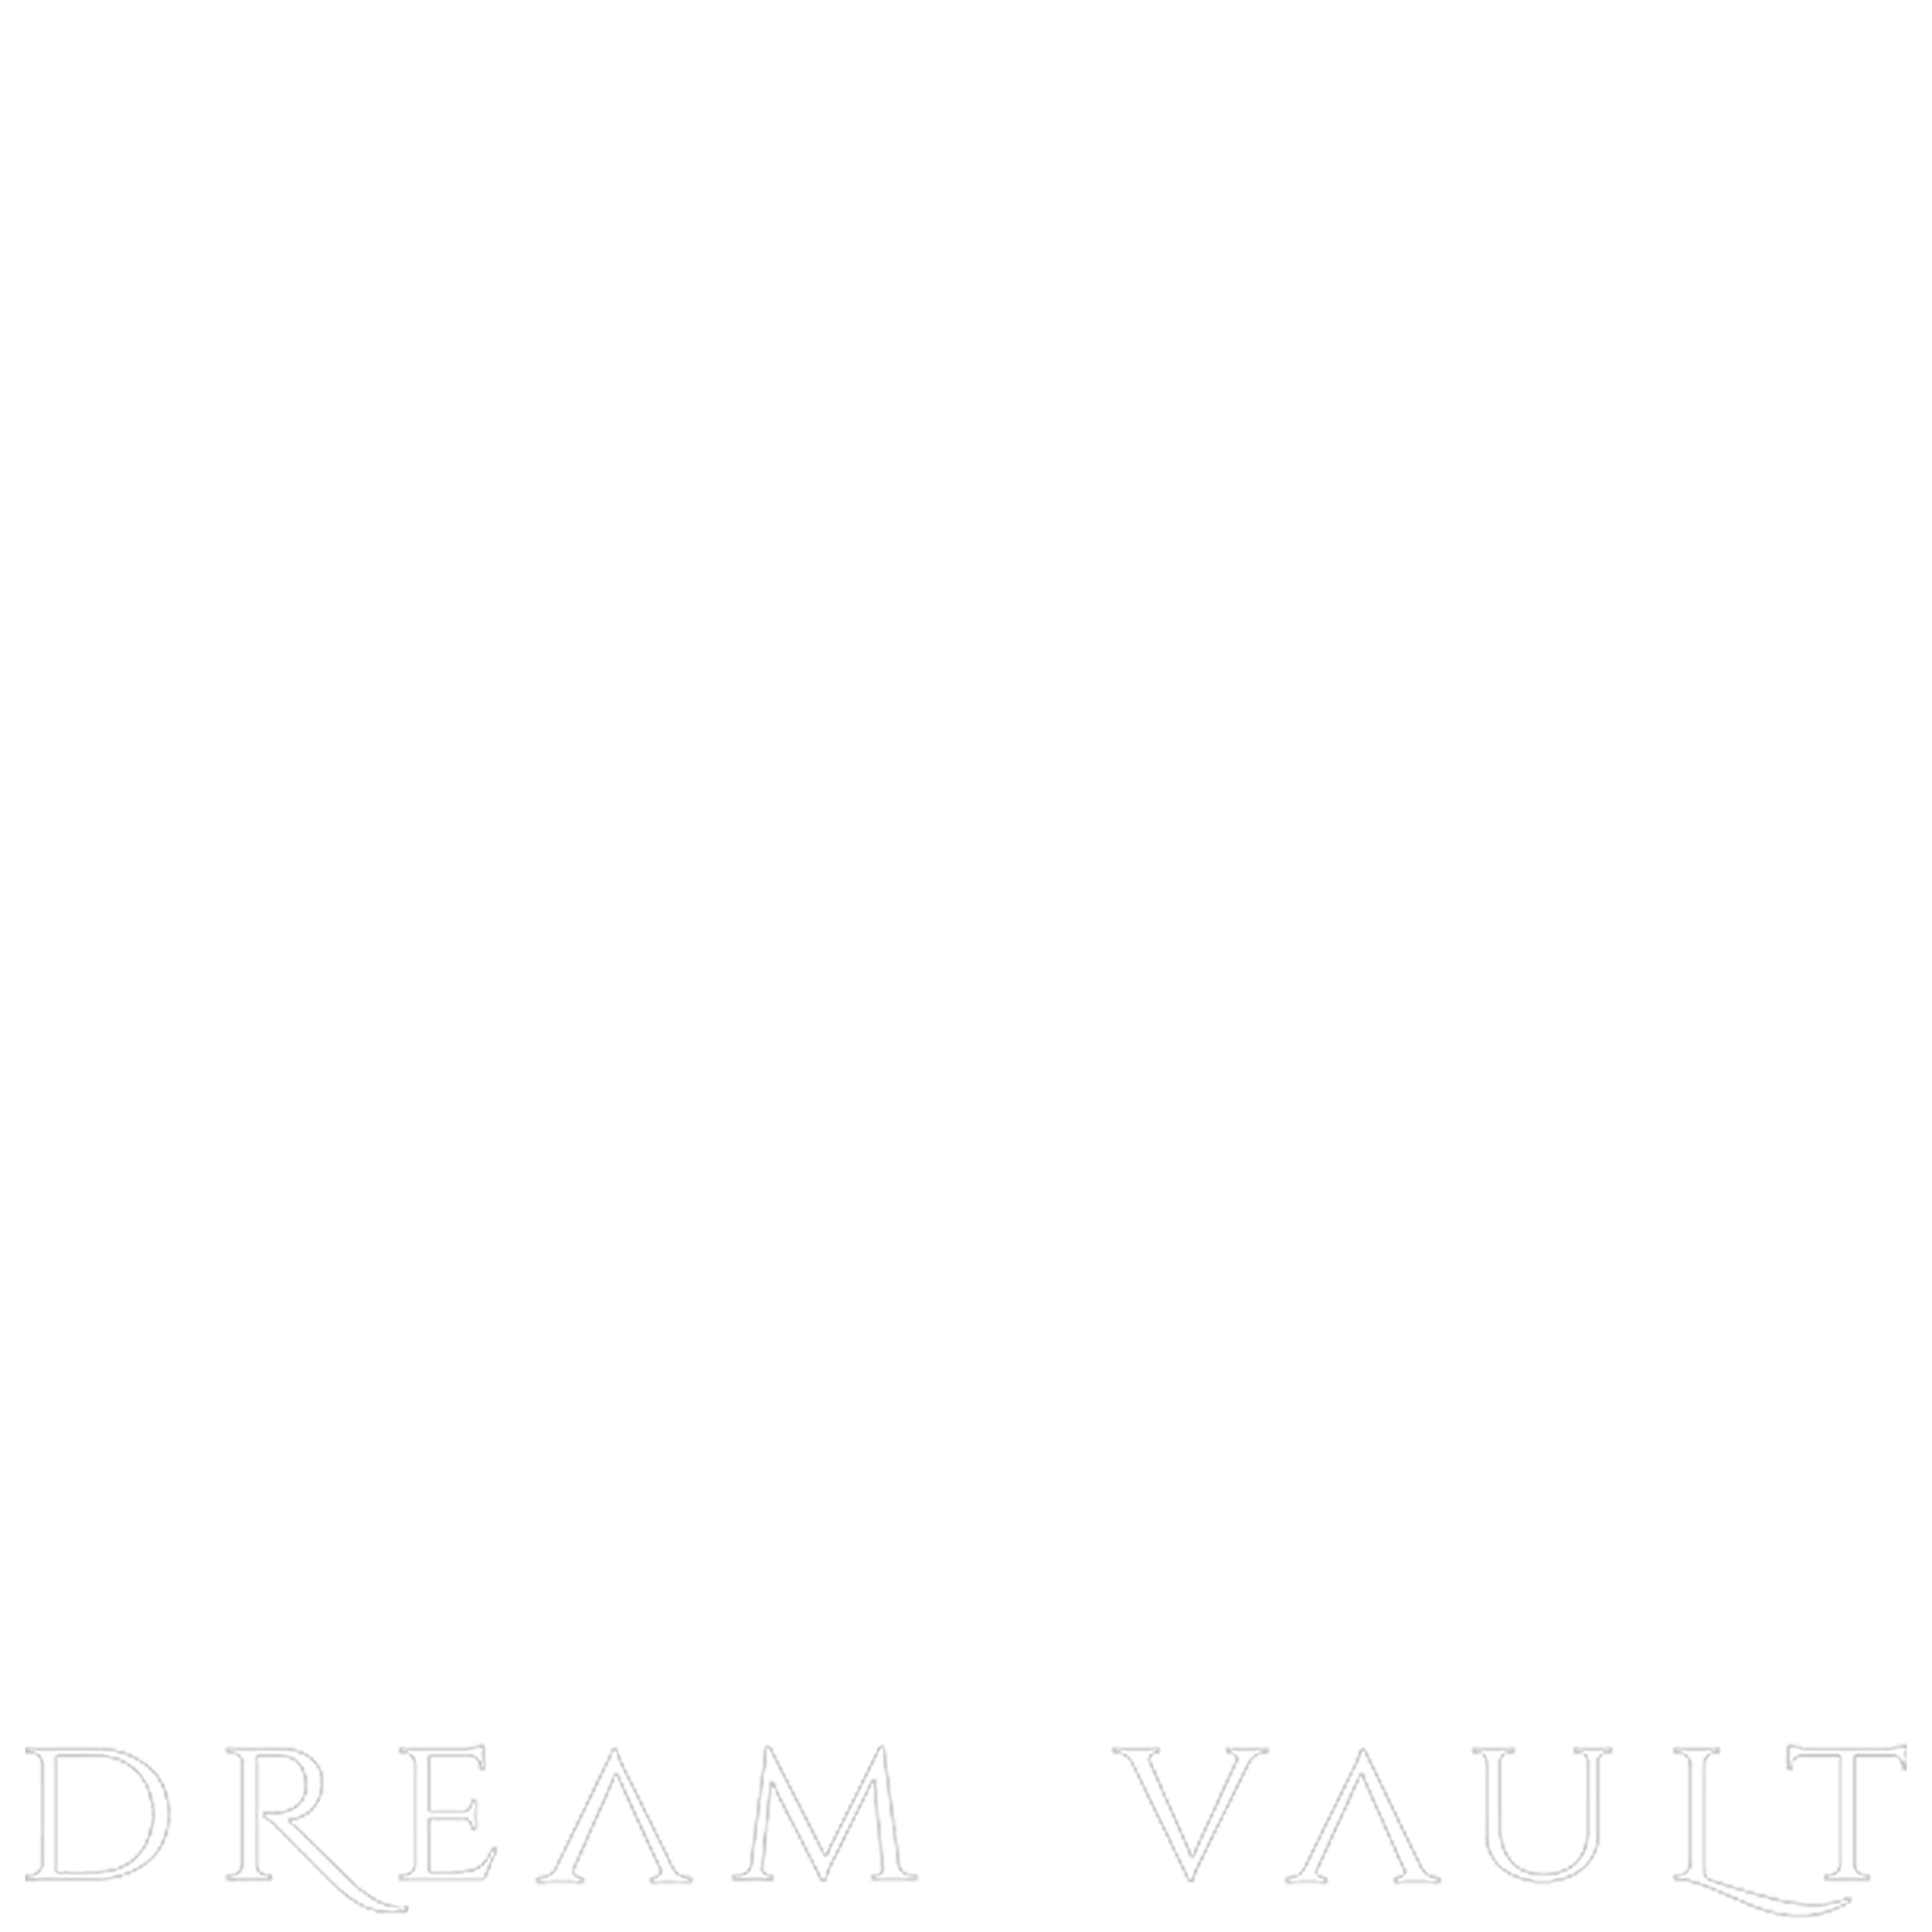 Dream Vault Records